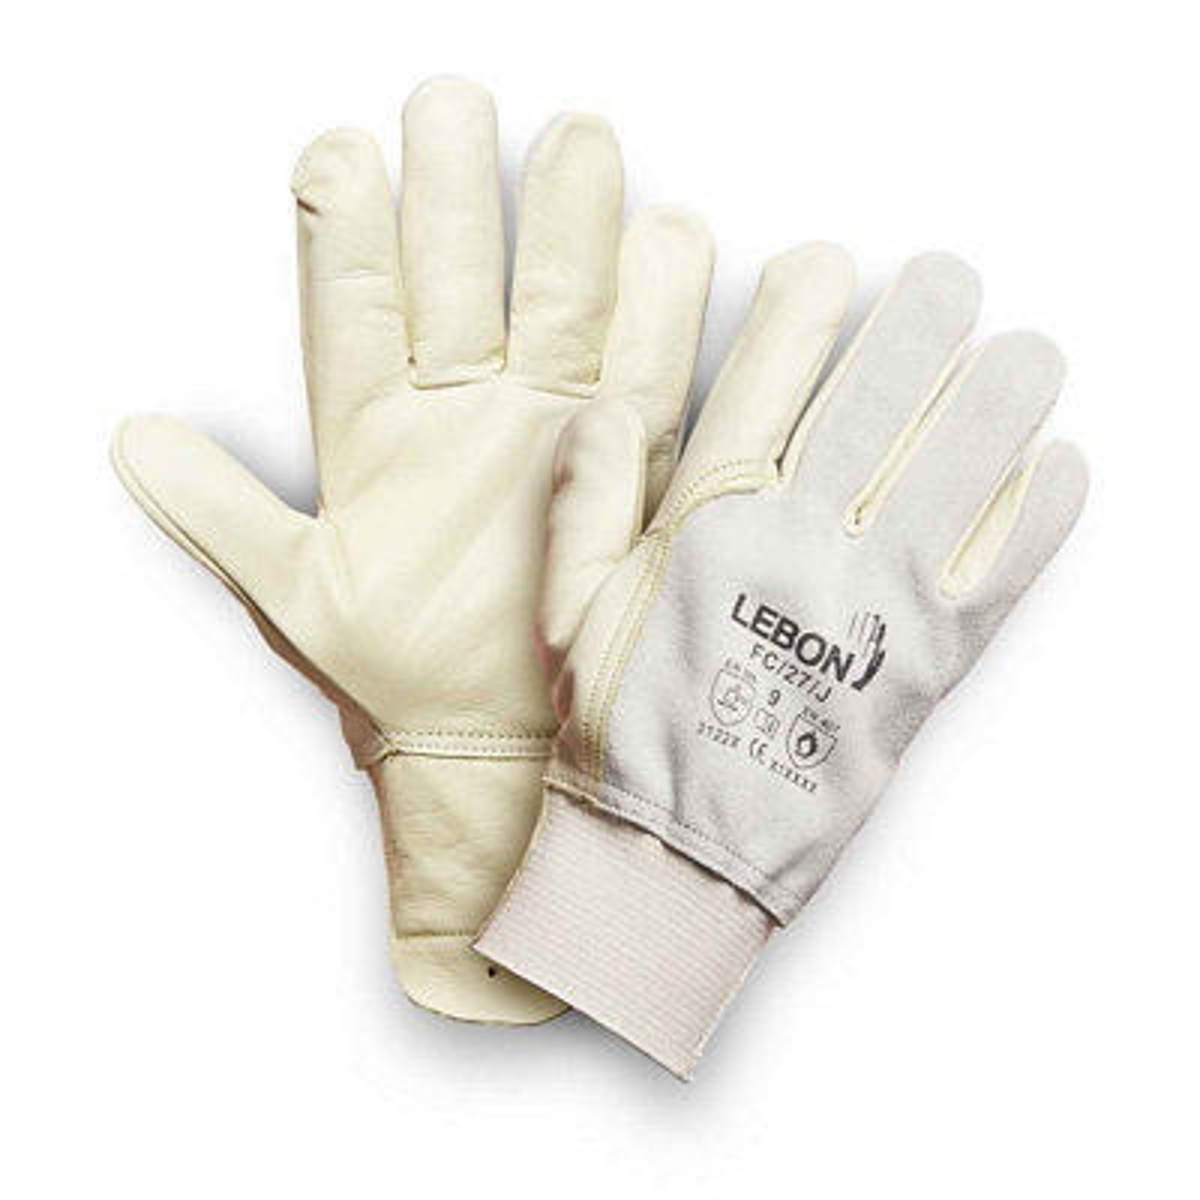 Gants FC/27J Lebon Protection